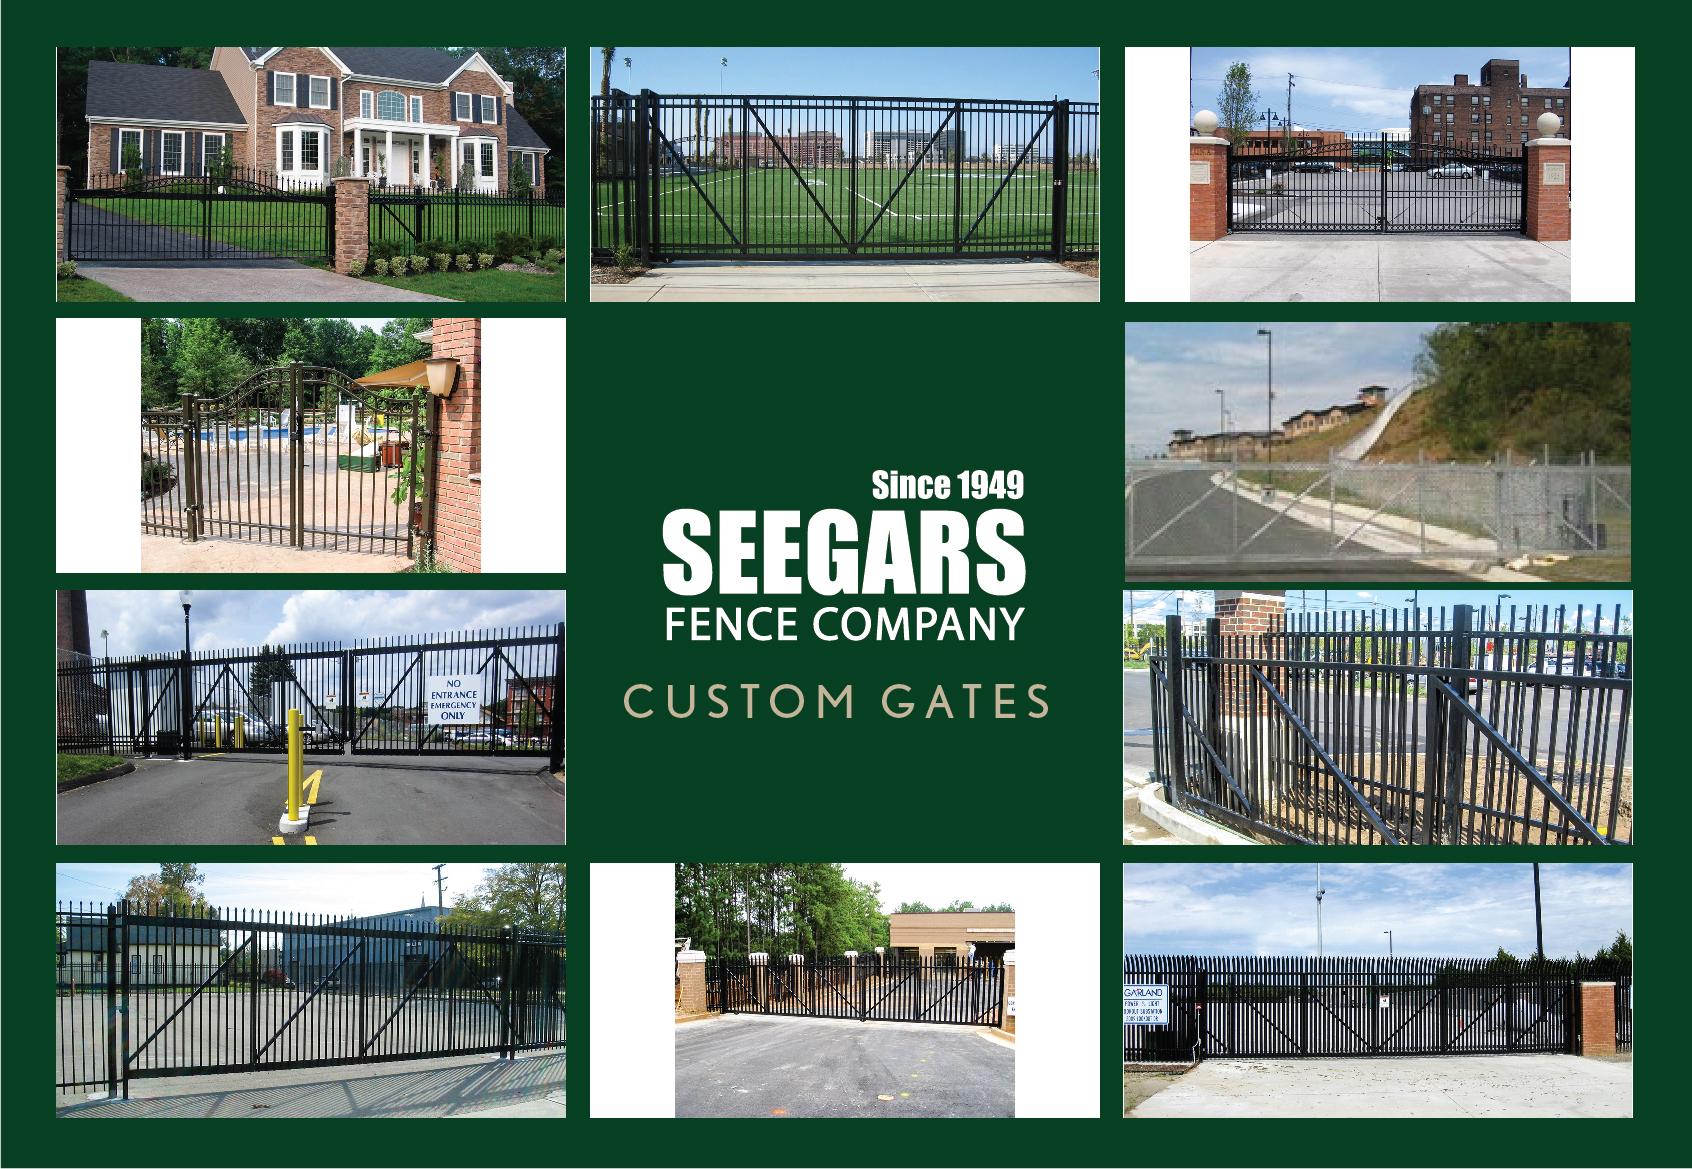 Gates1 Seegars Fence Company